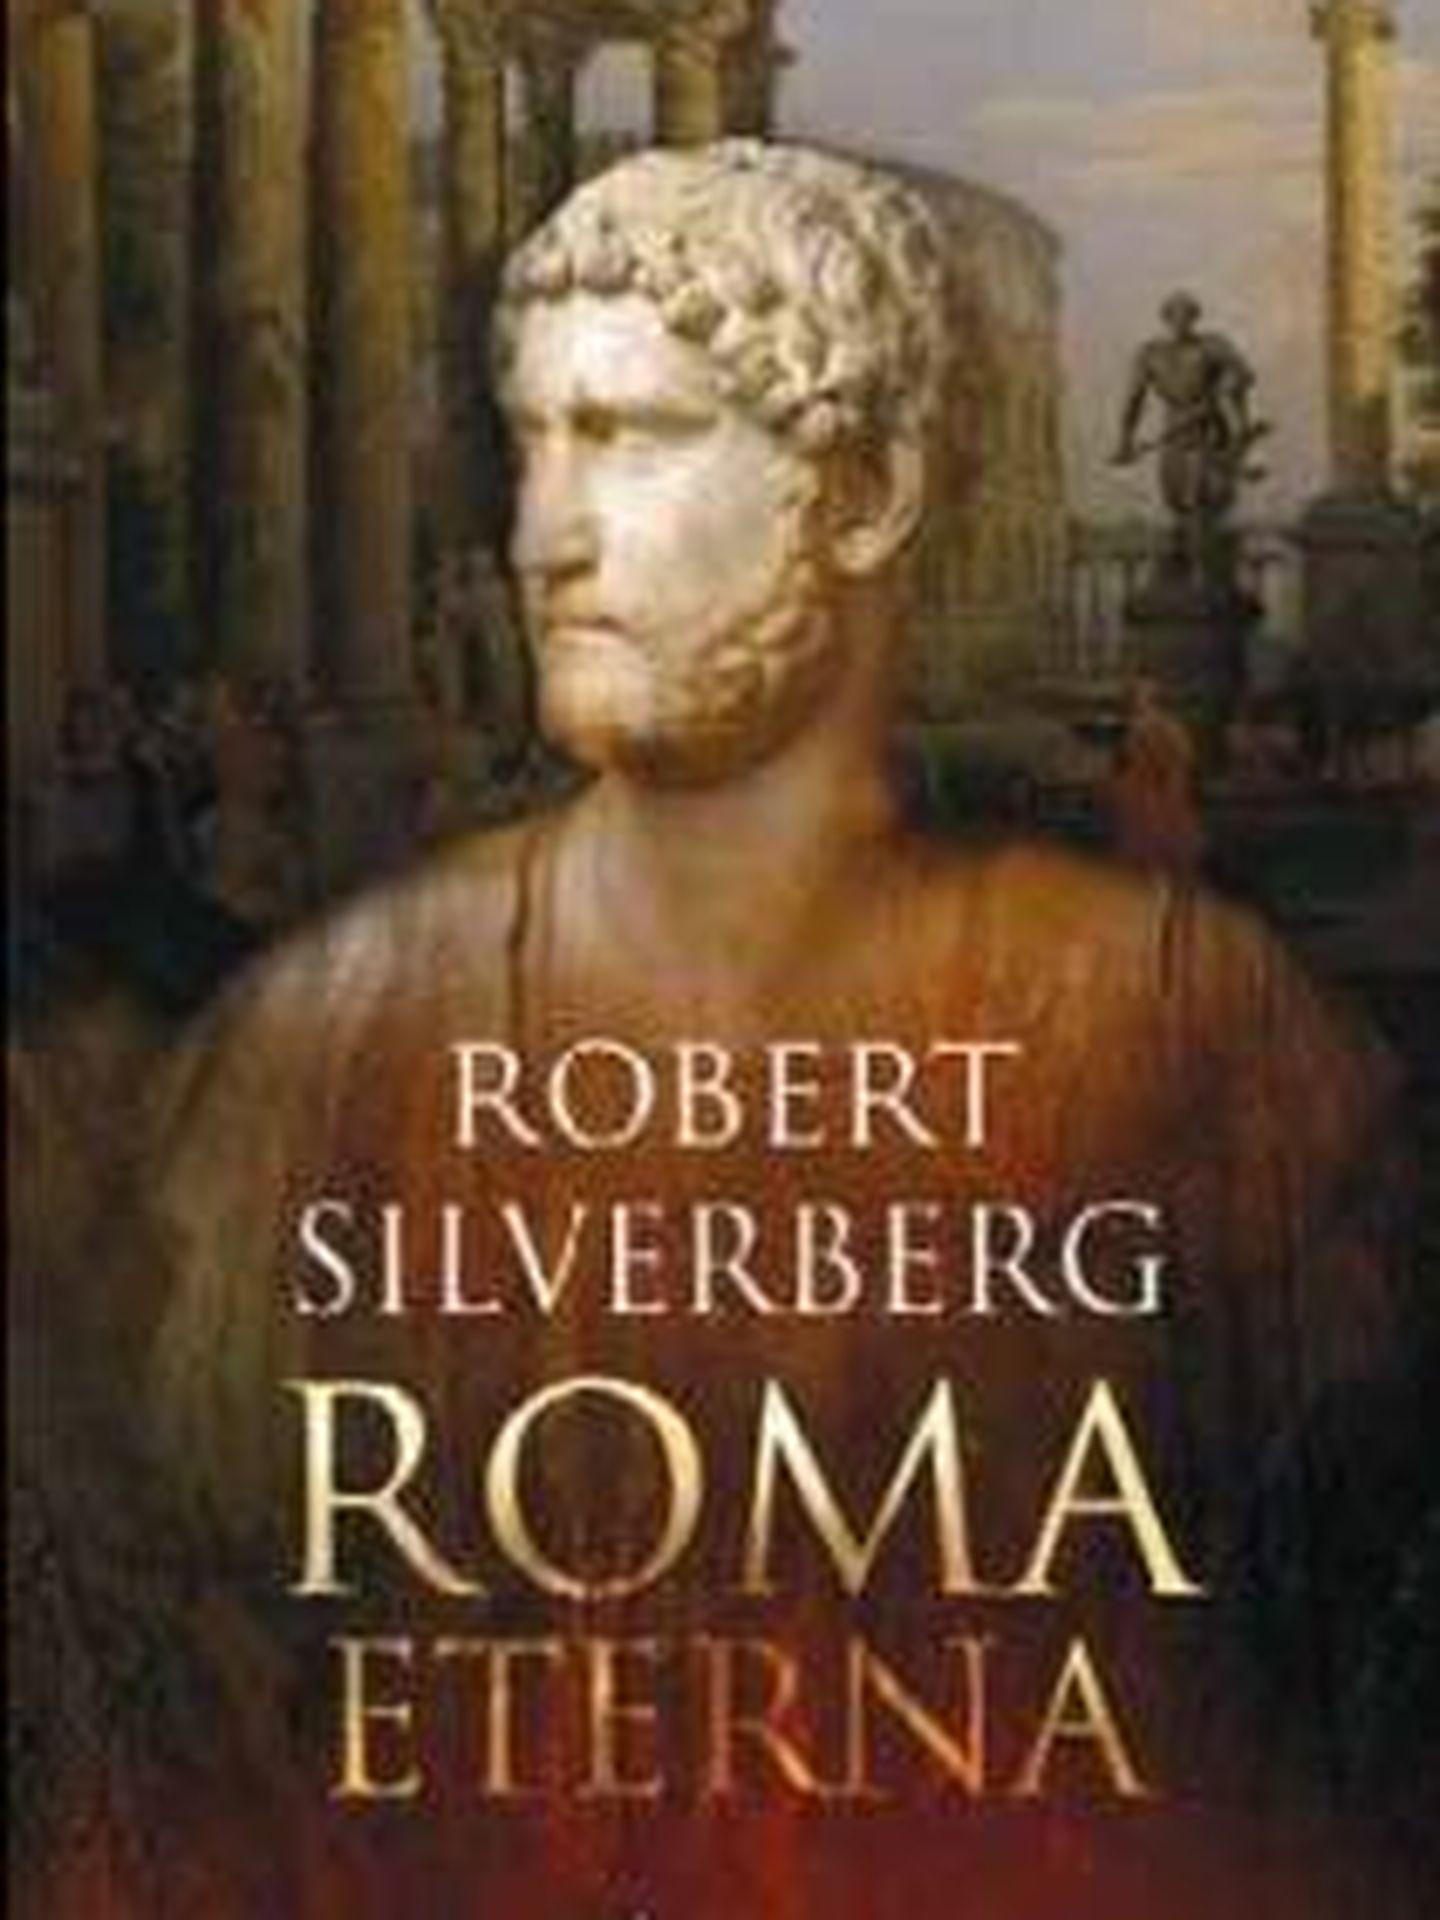 'Roma Eterna'